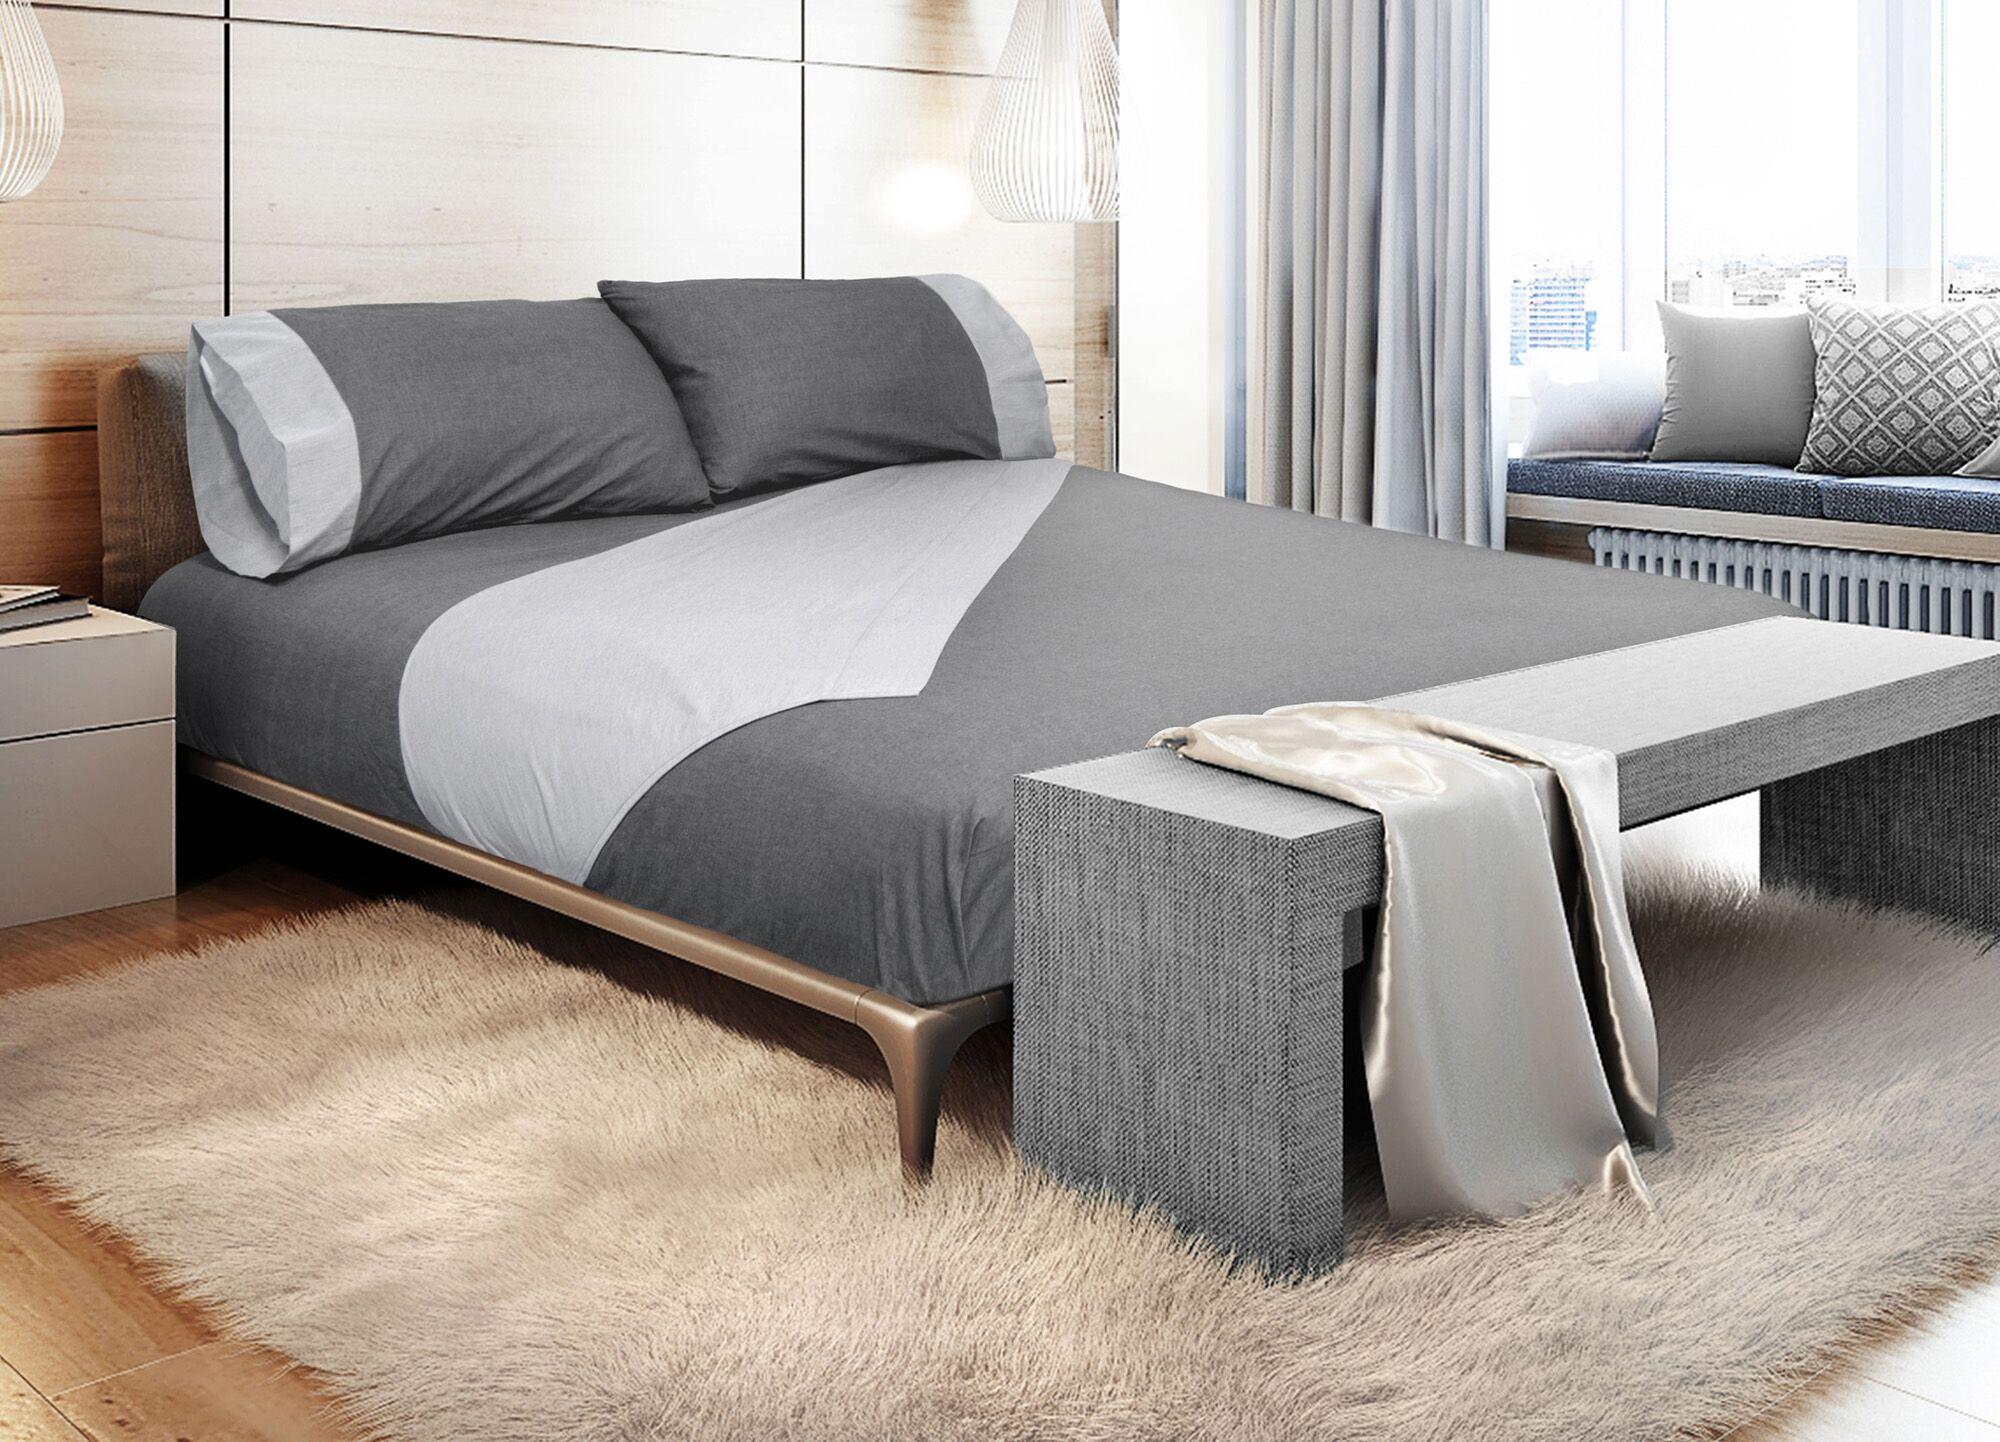 Binder 300 Thread Count 100% Cotton Sheet Set Color: Dark Gray, Size: Queen